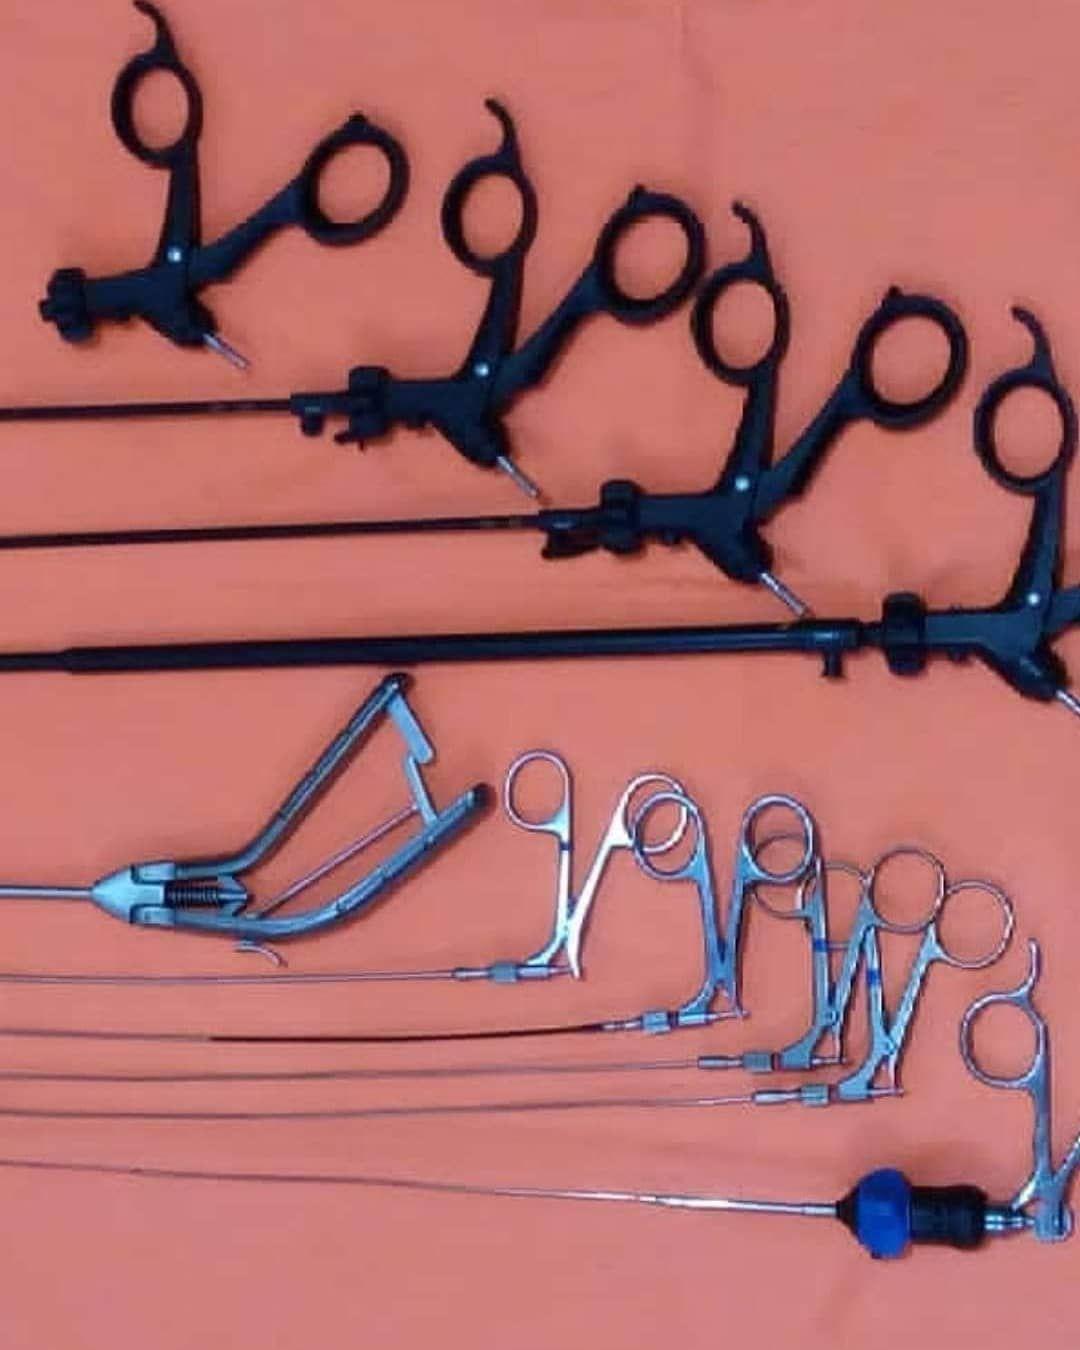 Pin by Athleta Instruments on Athleta Instruments